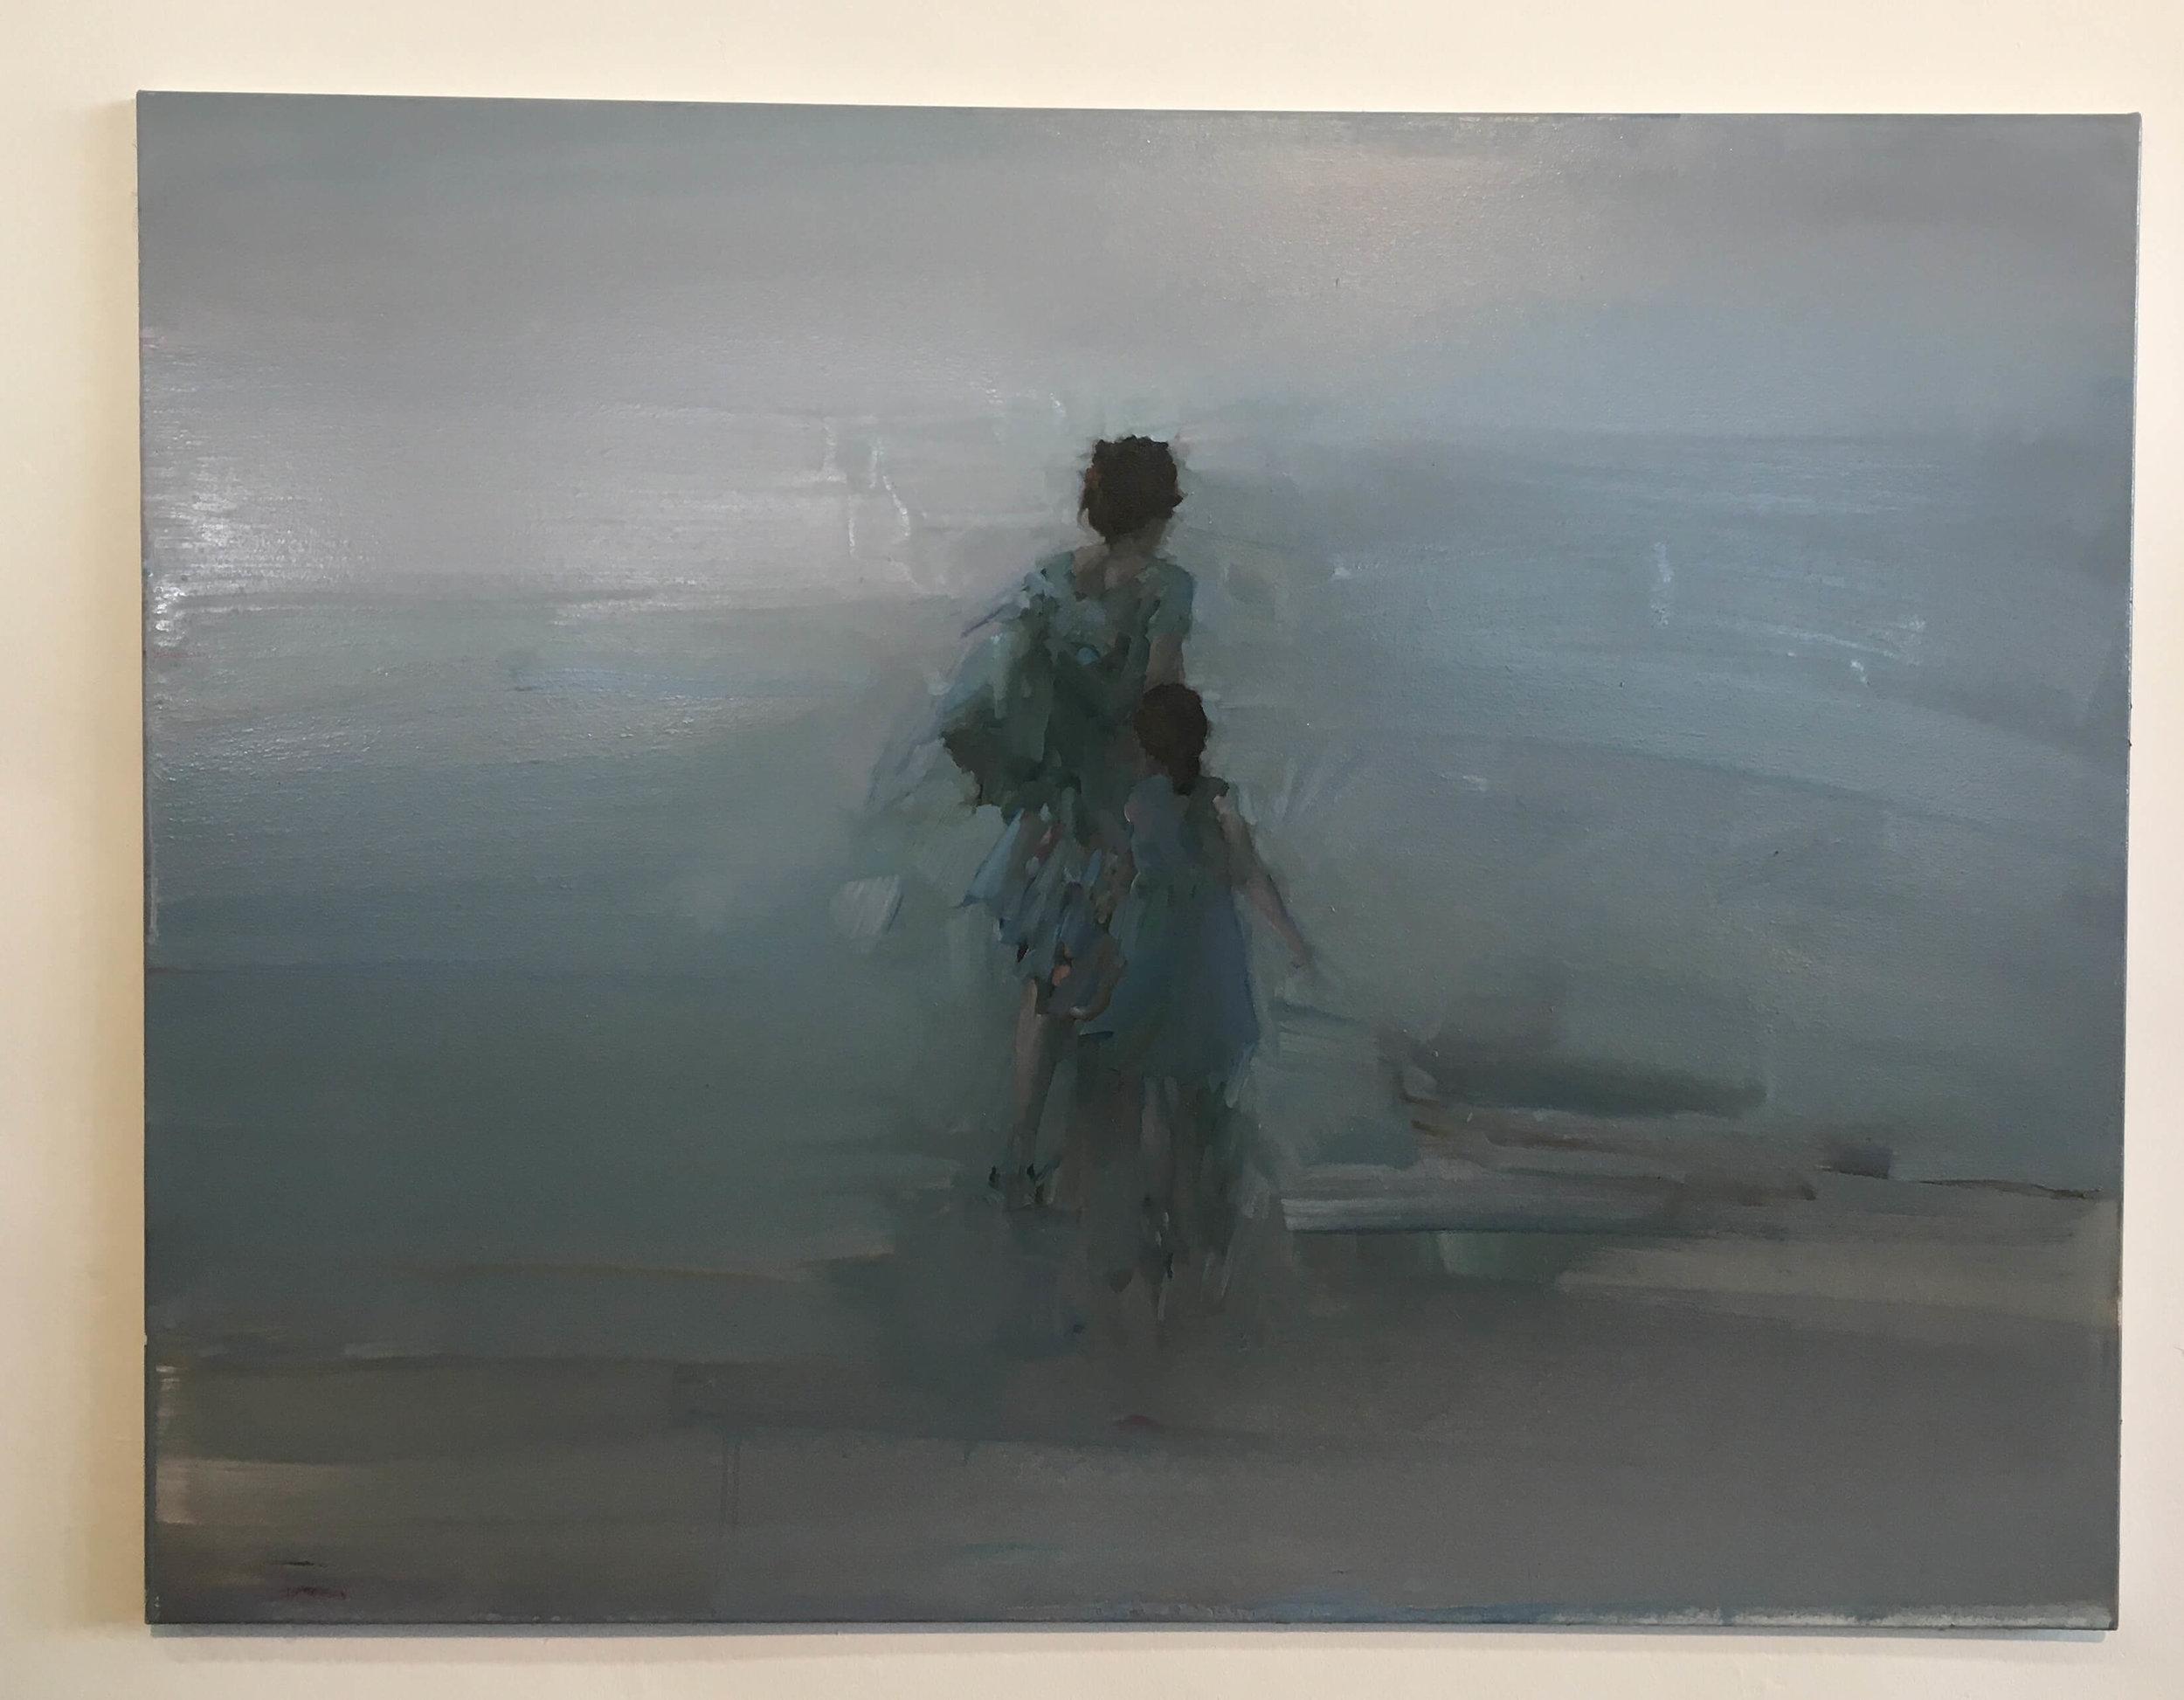 Radoslava Markova, Öl auf Leinwand, Foto: U. Latzke